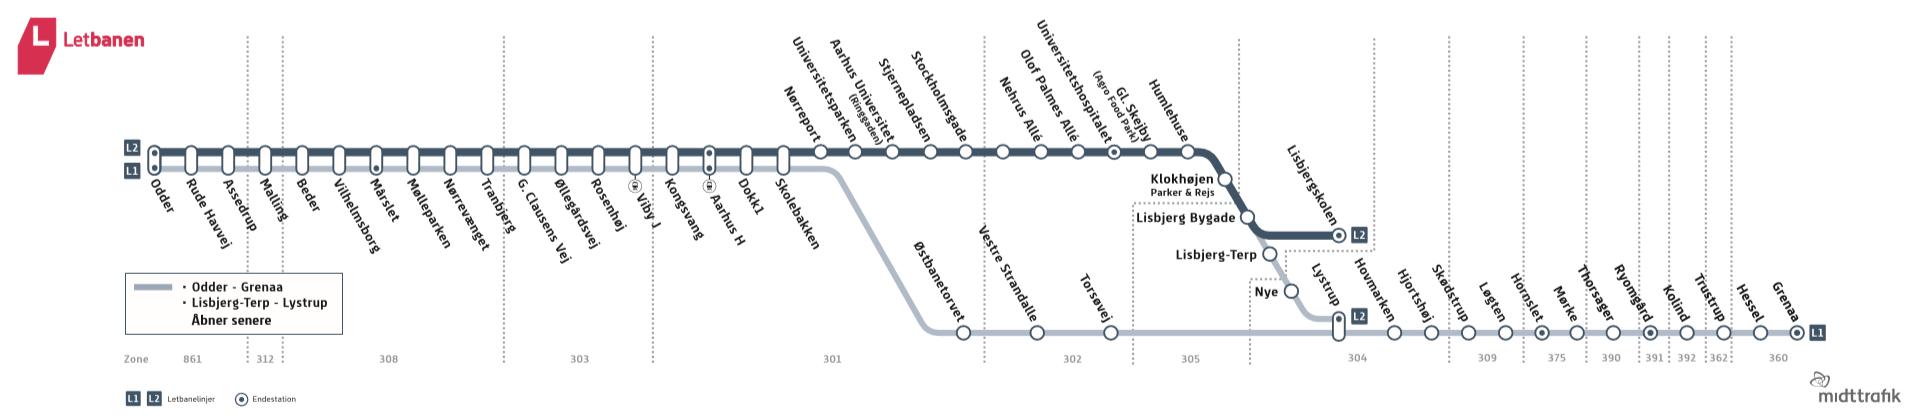 Letbanens linjekarta fr.o.m 2018-08-25 Bild: midttrafik